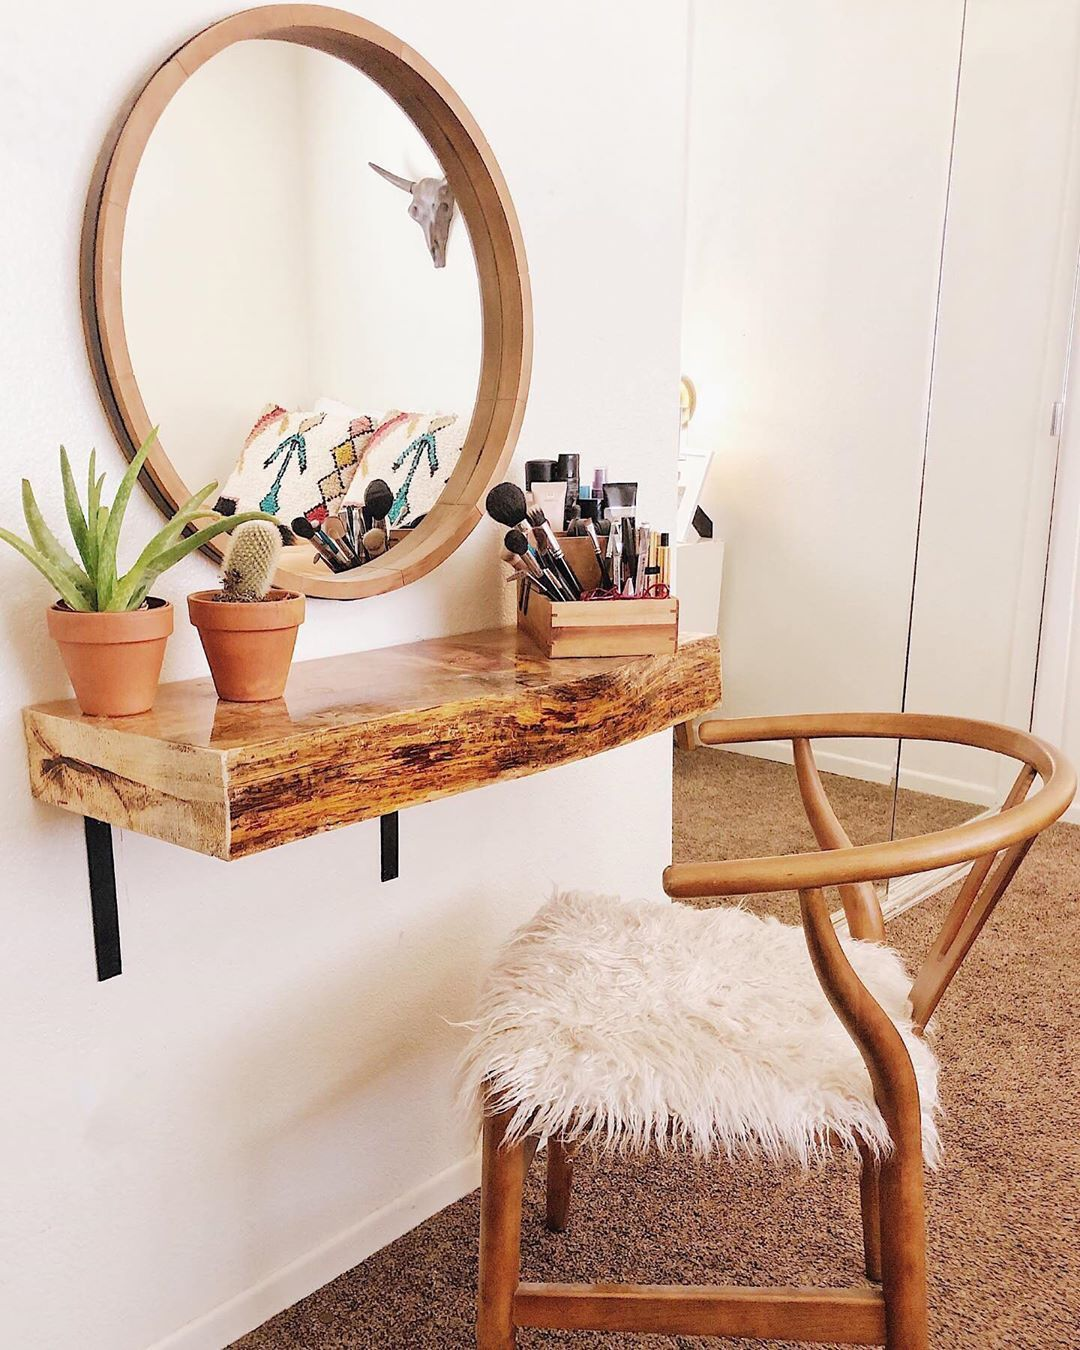 "World Market (@worldmarket) posted on Instagram: ""Crushing on this DIY vanity space by @ourlittledeserthome! (link in profile to shop) #WorldMarket #HomeDecor"" • Aug 17, 2019 at 12:01am UTC"